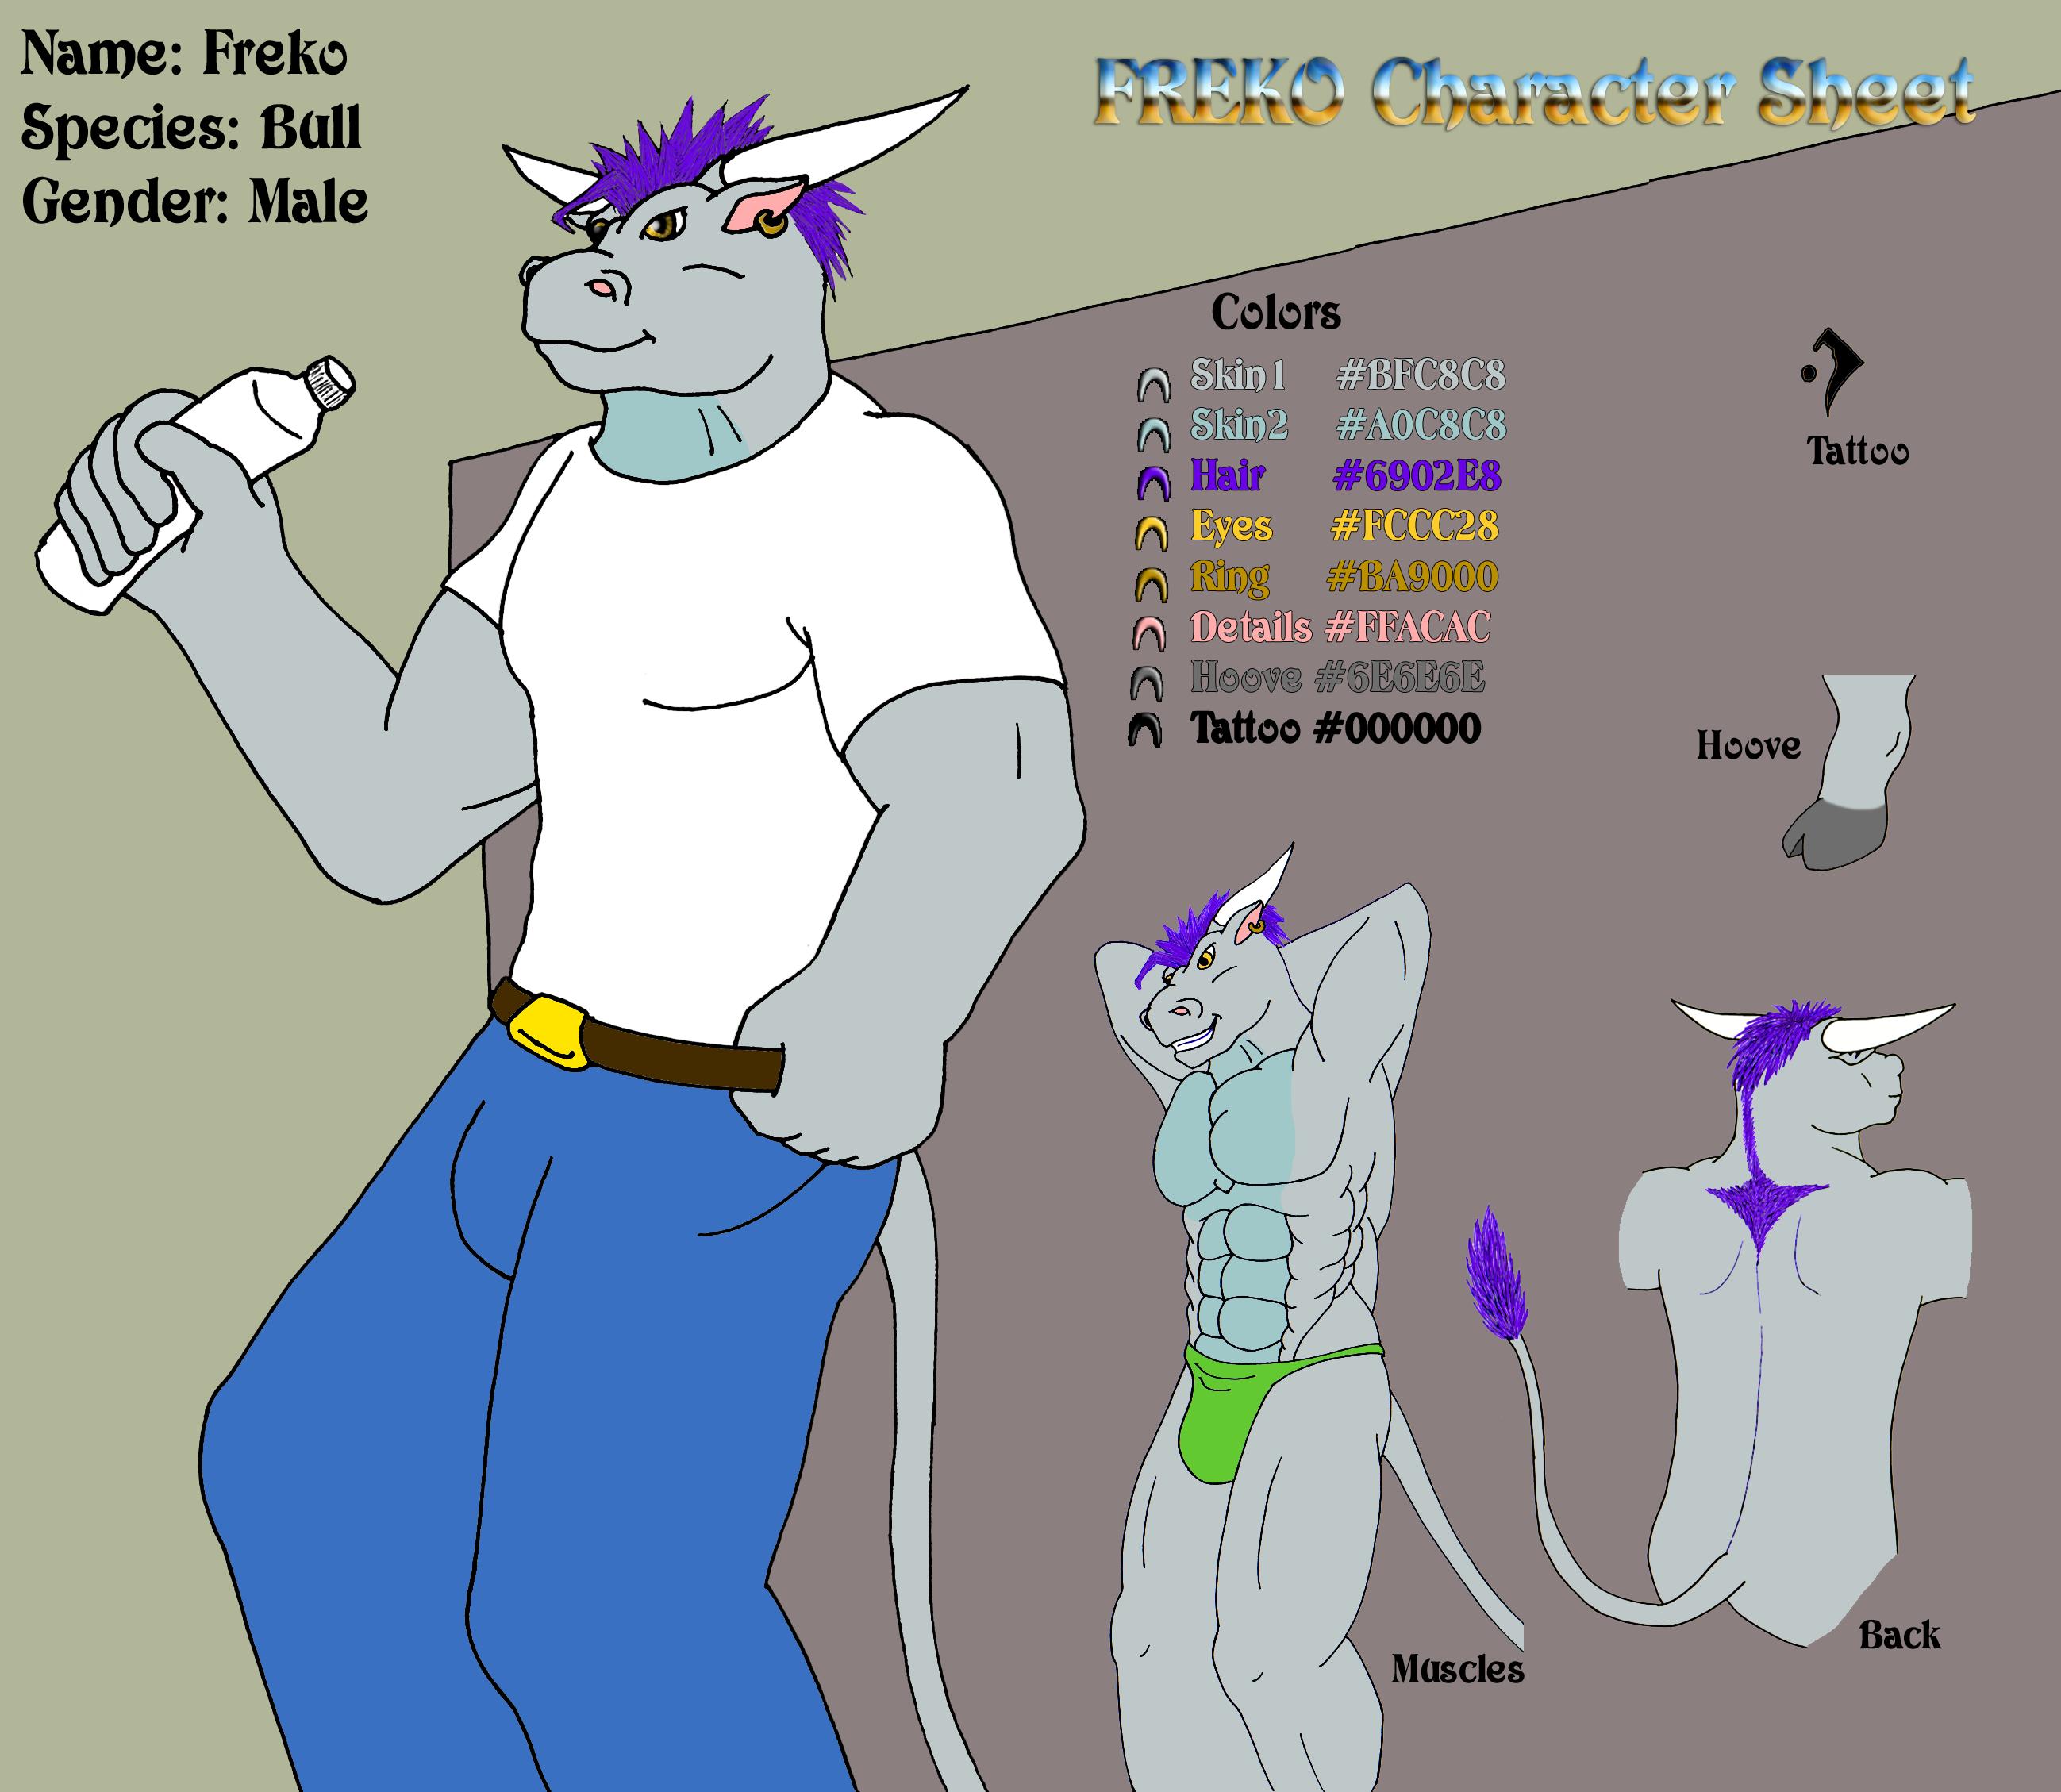 Character Sheet - Freko